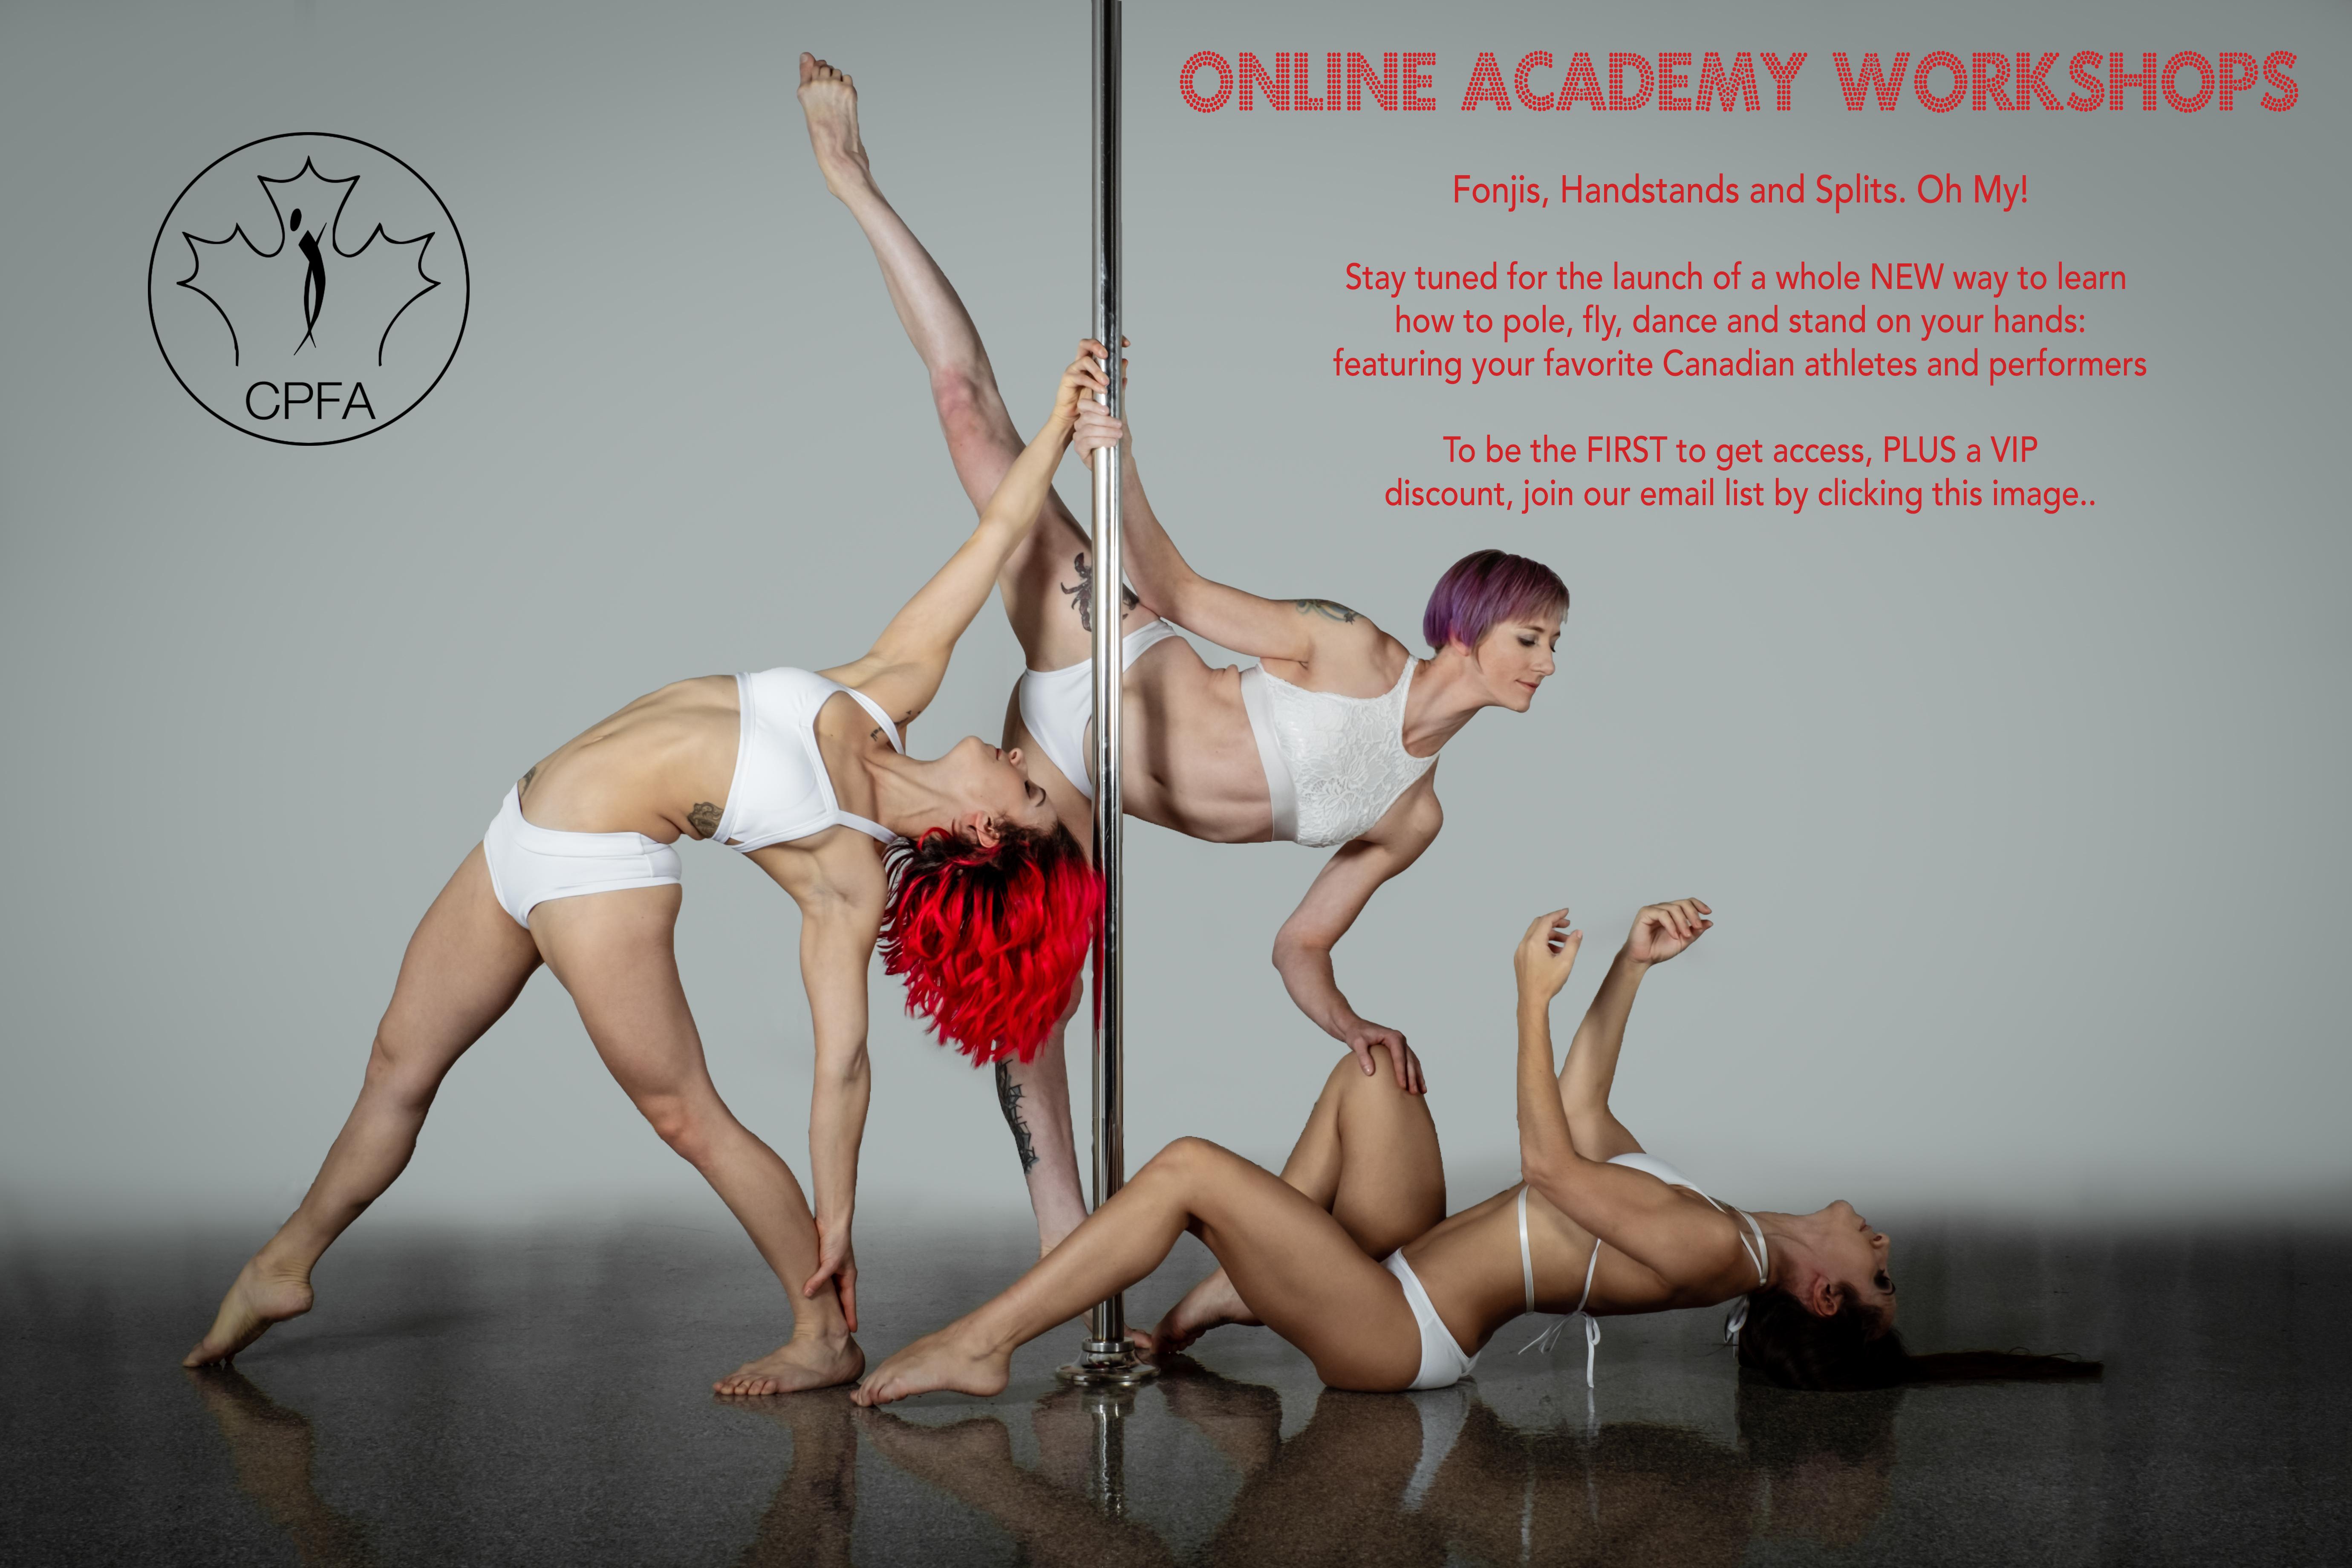 Online Academy Workshops Coming Soon!